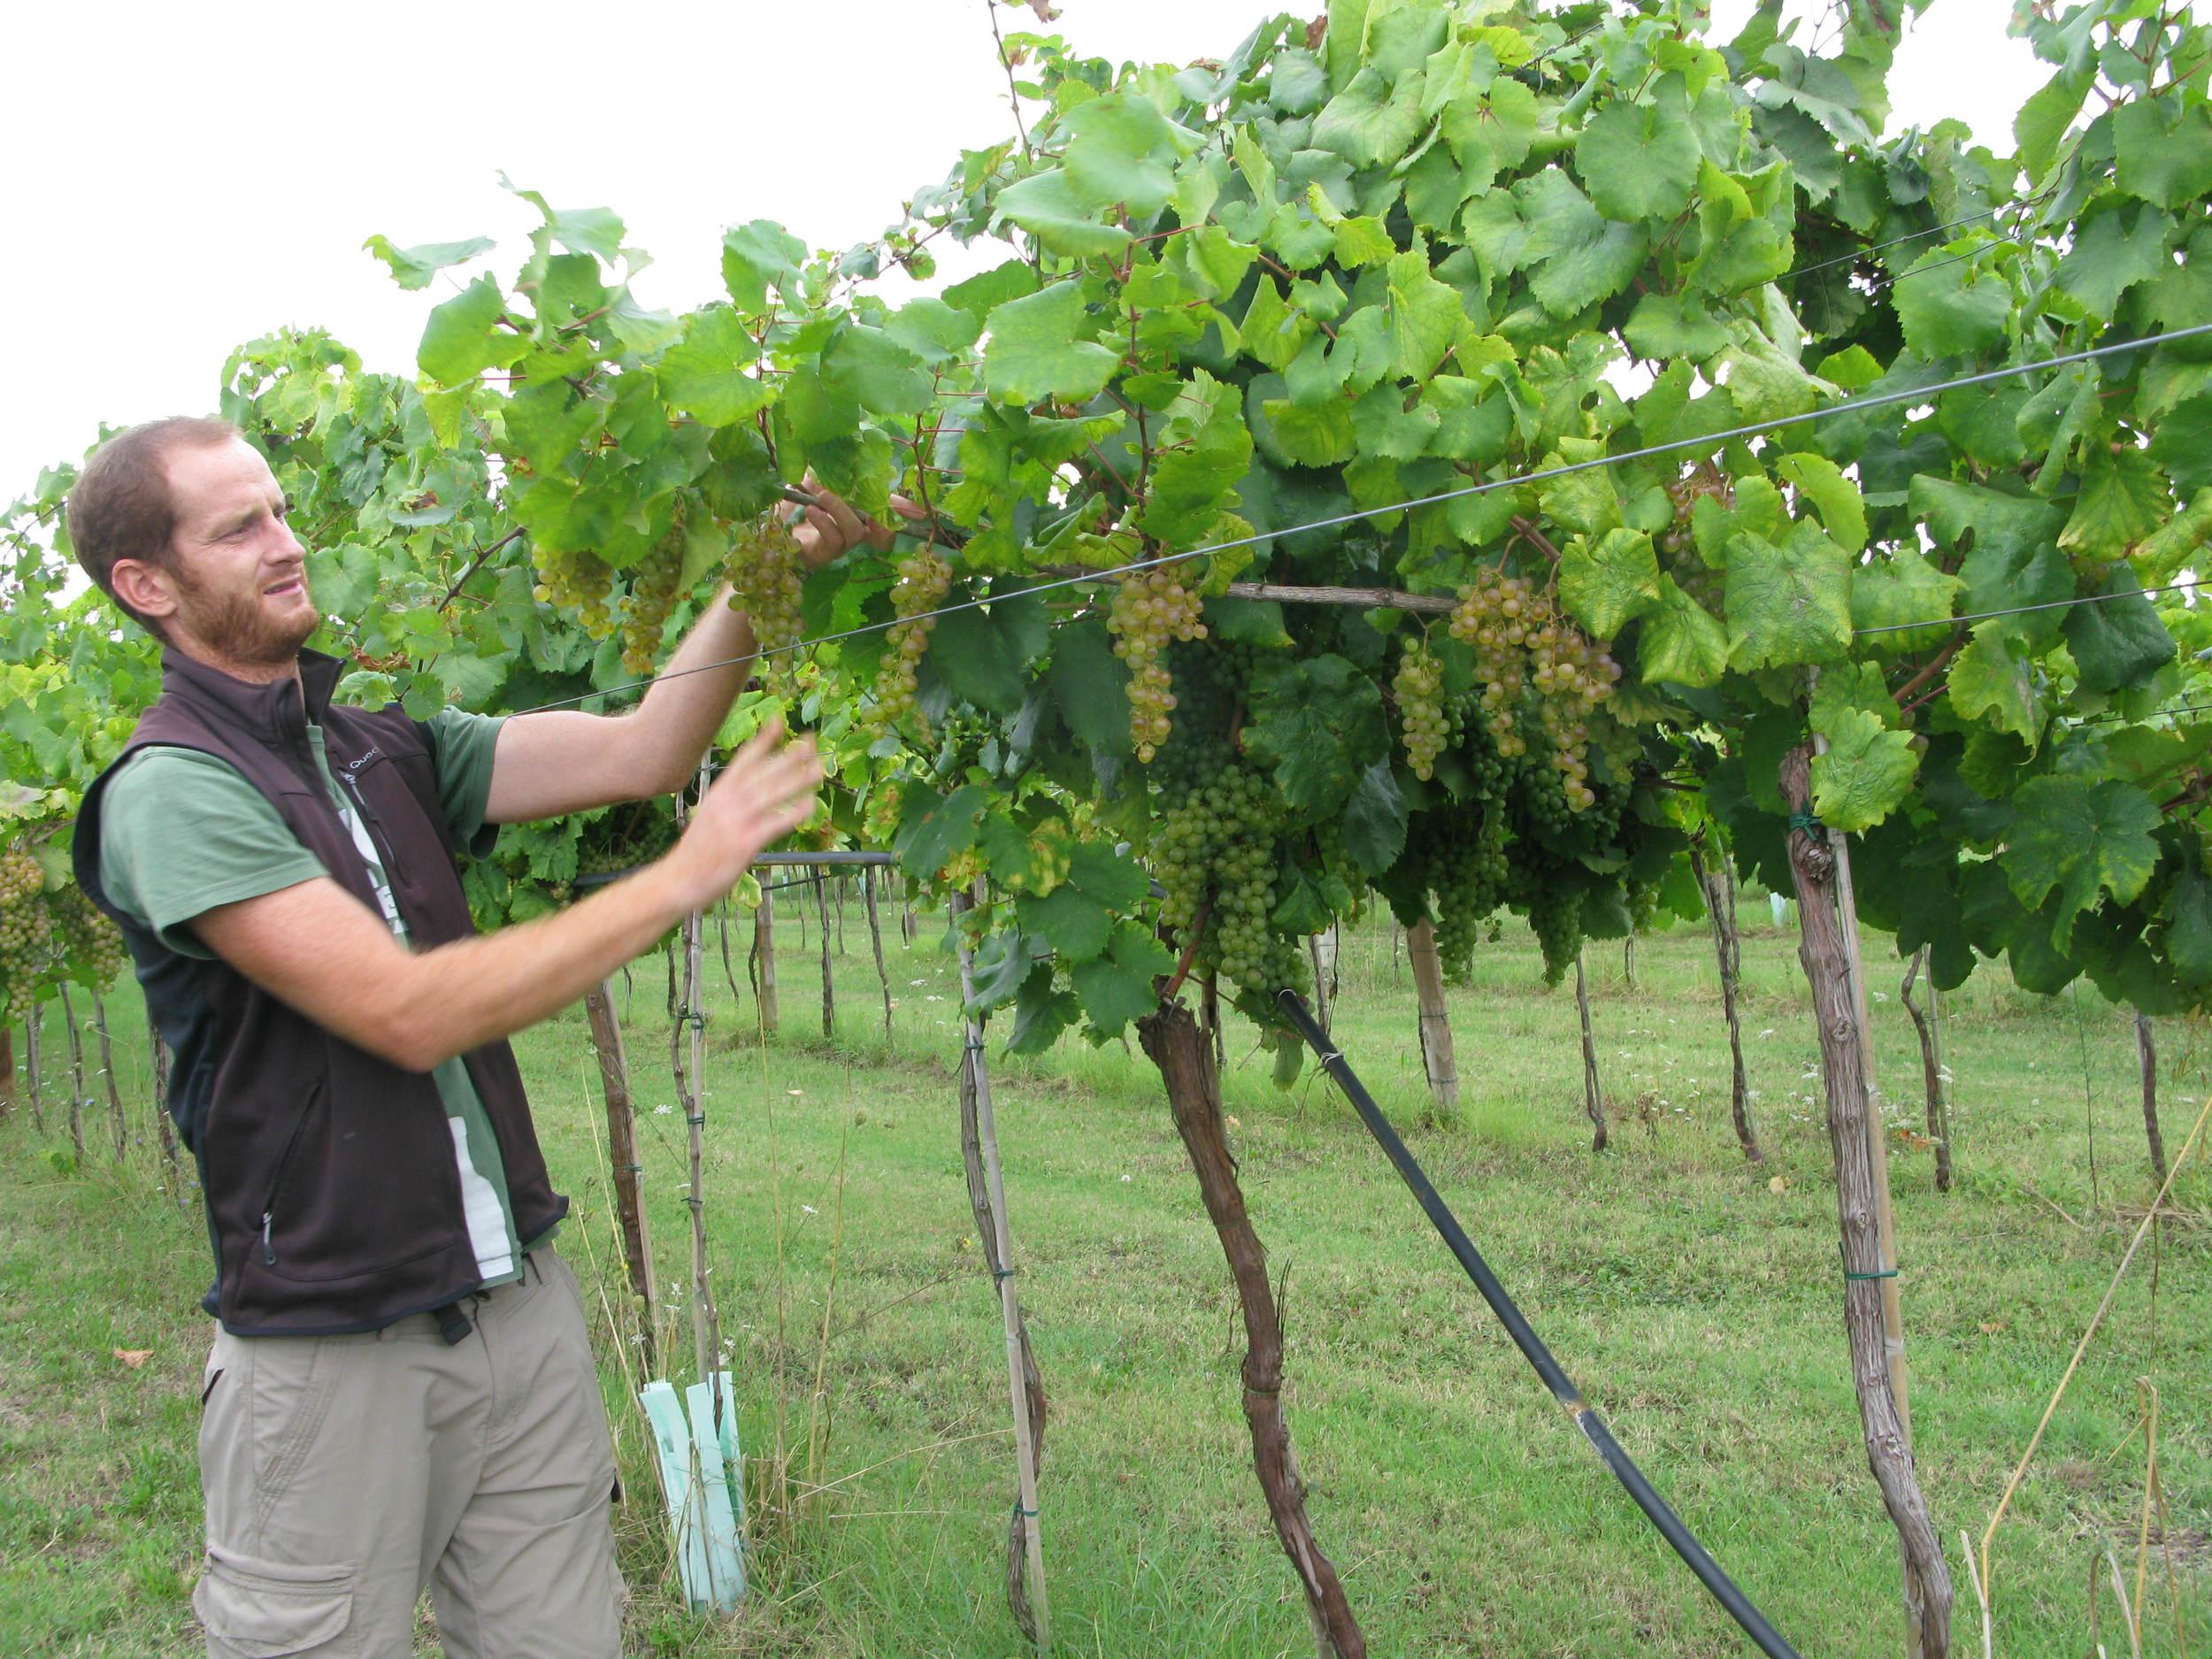 Examining the Famoso grapes